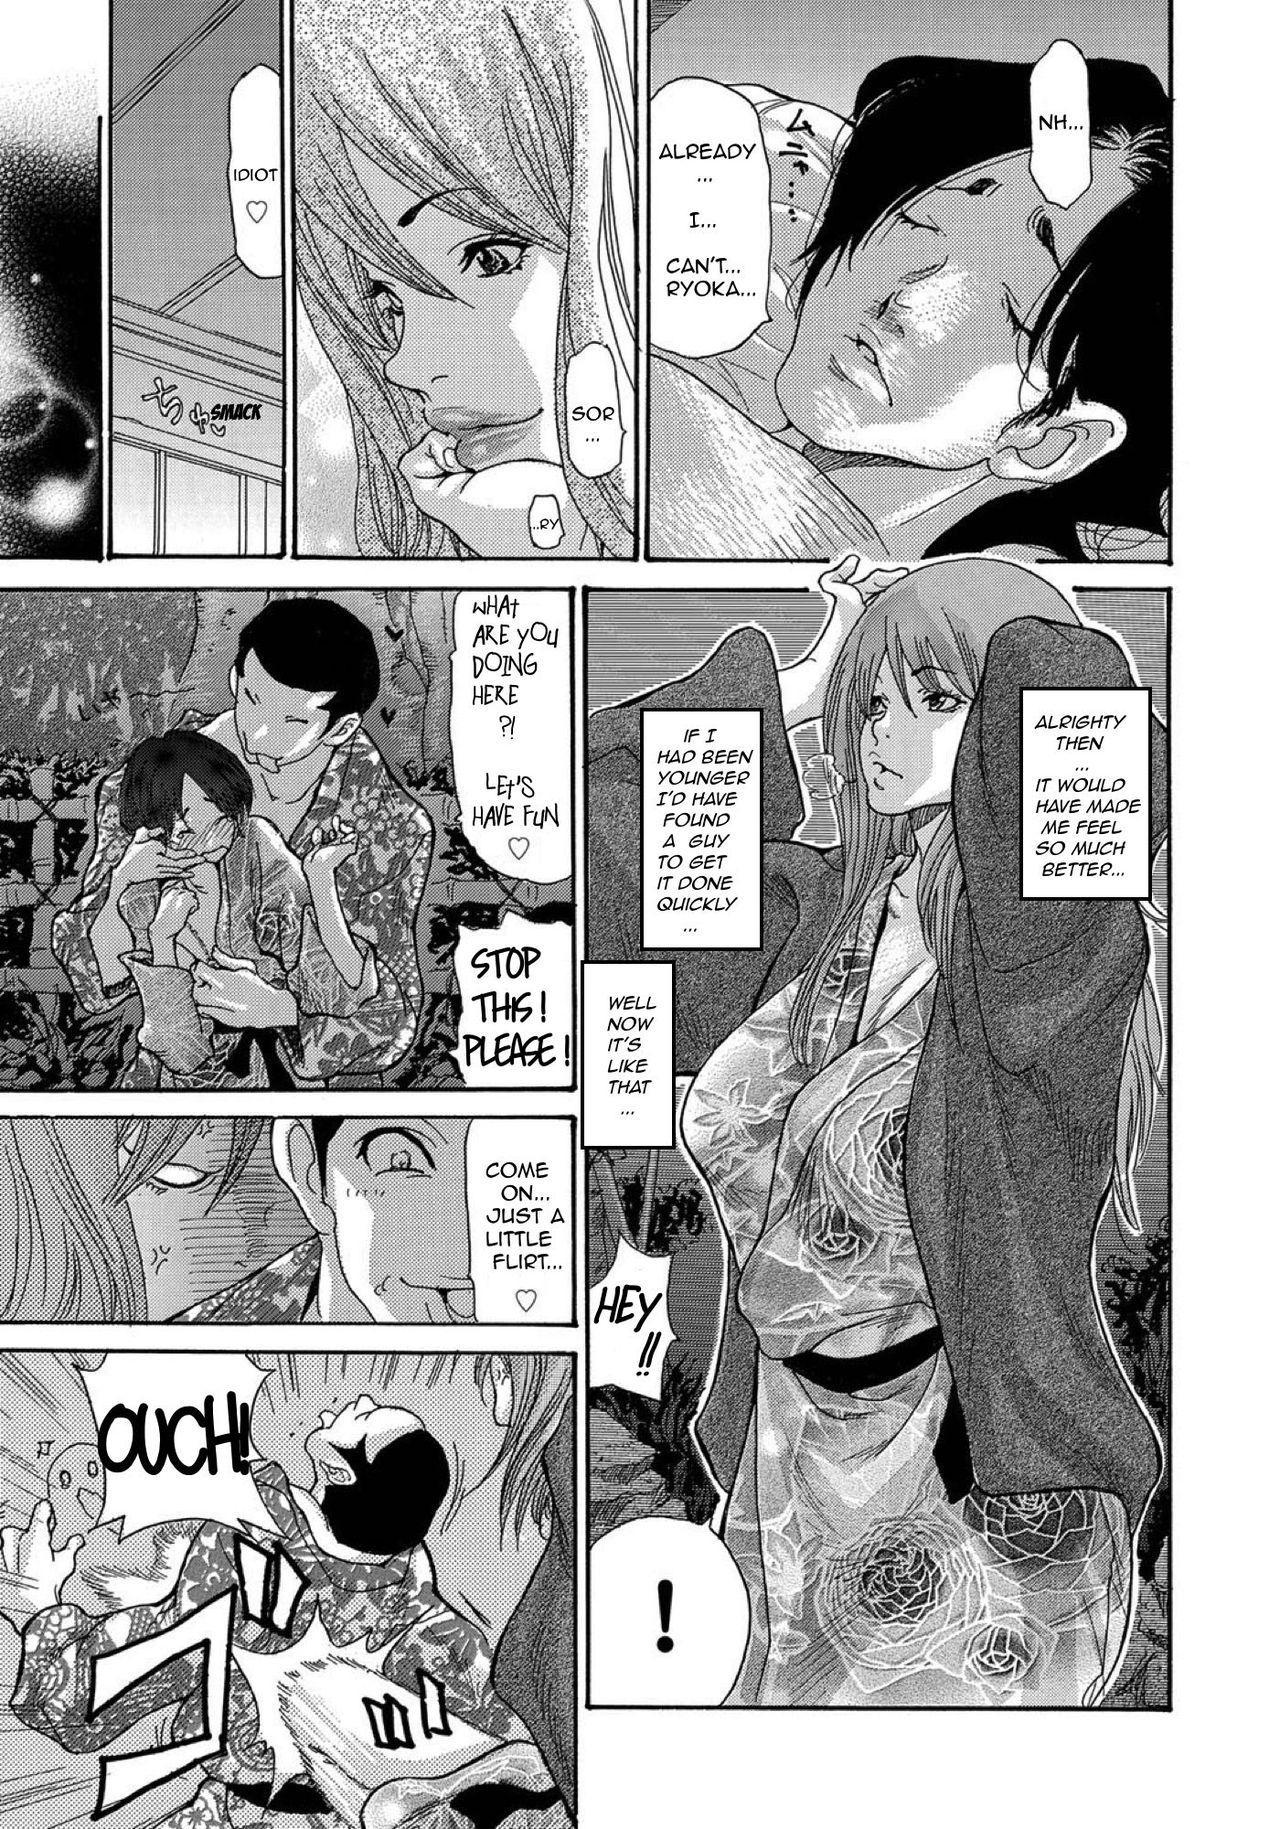 [Aoi Hitori] Yankee Zuma Kanraku!-Extended-Chapter 1-ONGOING[decensored][English][R-IC]ONGOING 8